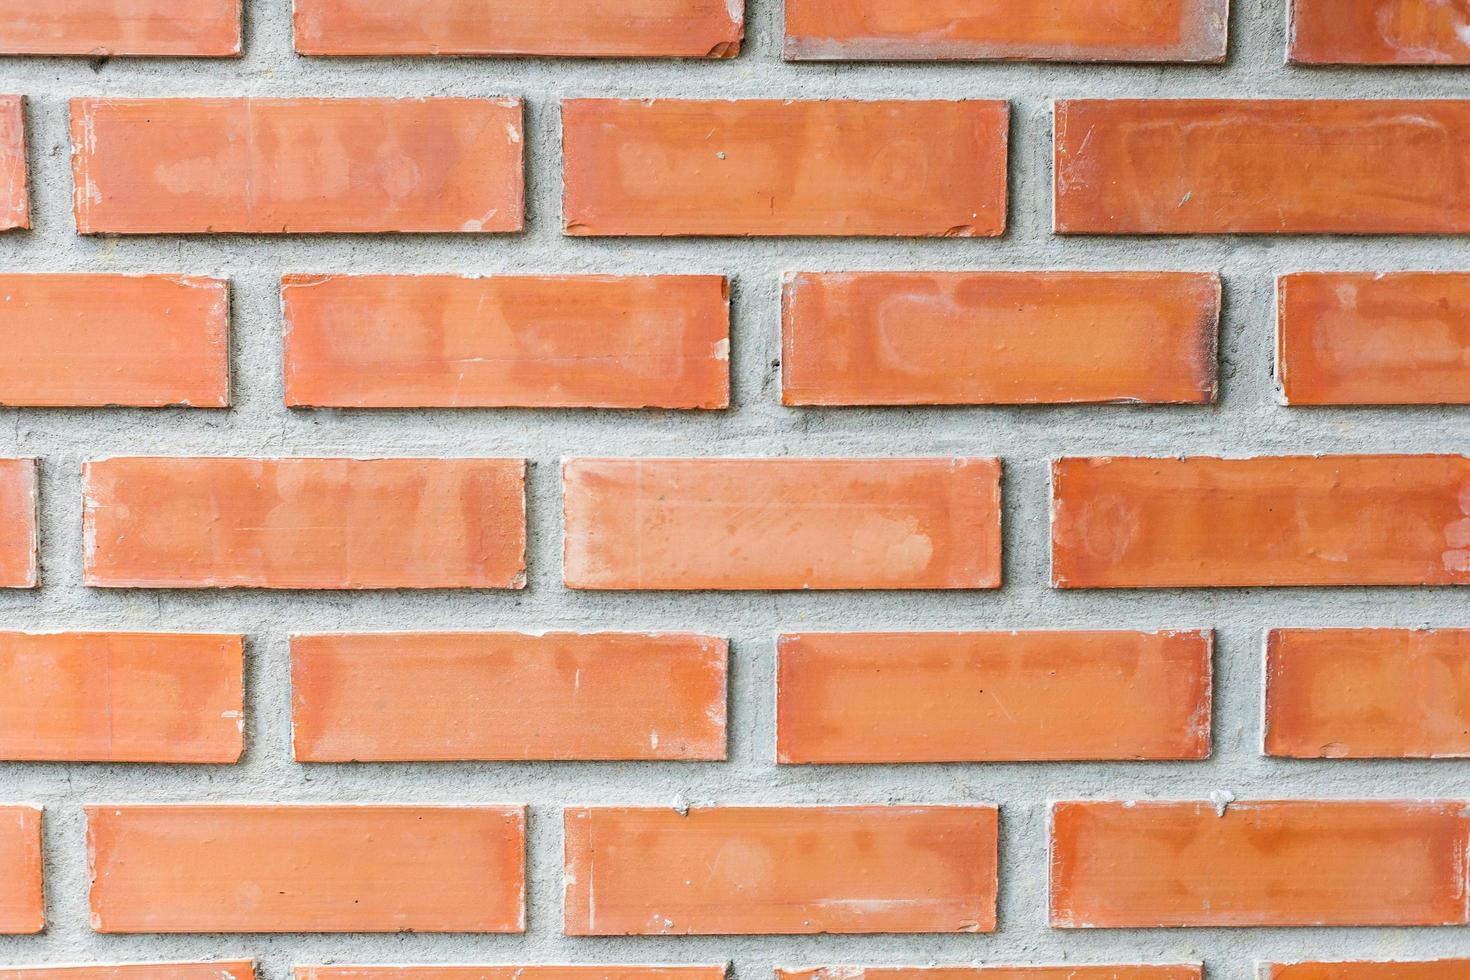 primer plano de la pared de ladrillo rojo foto